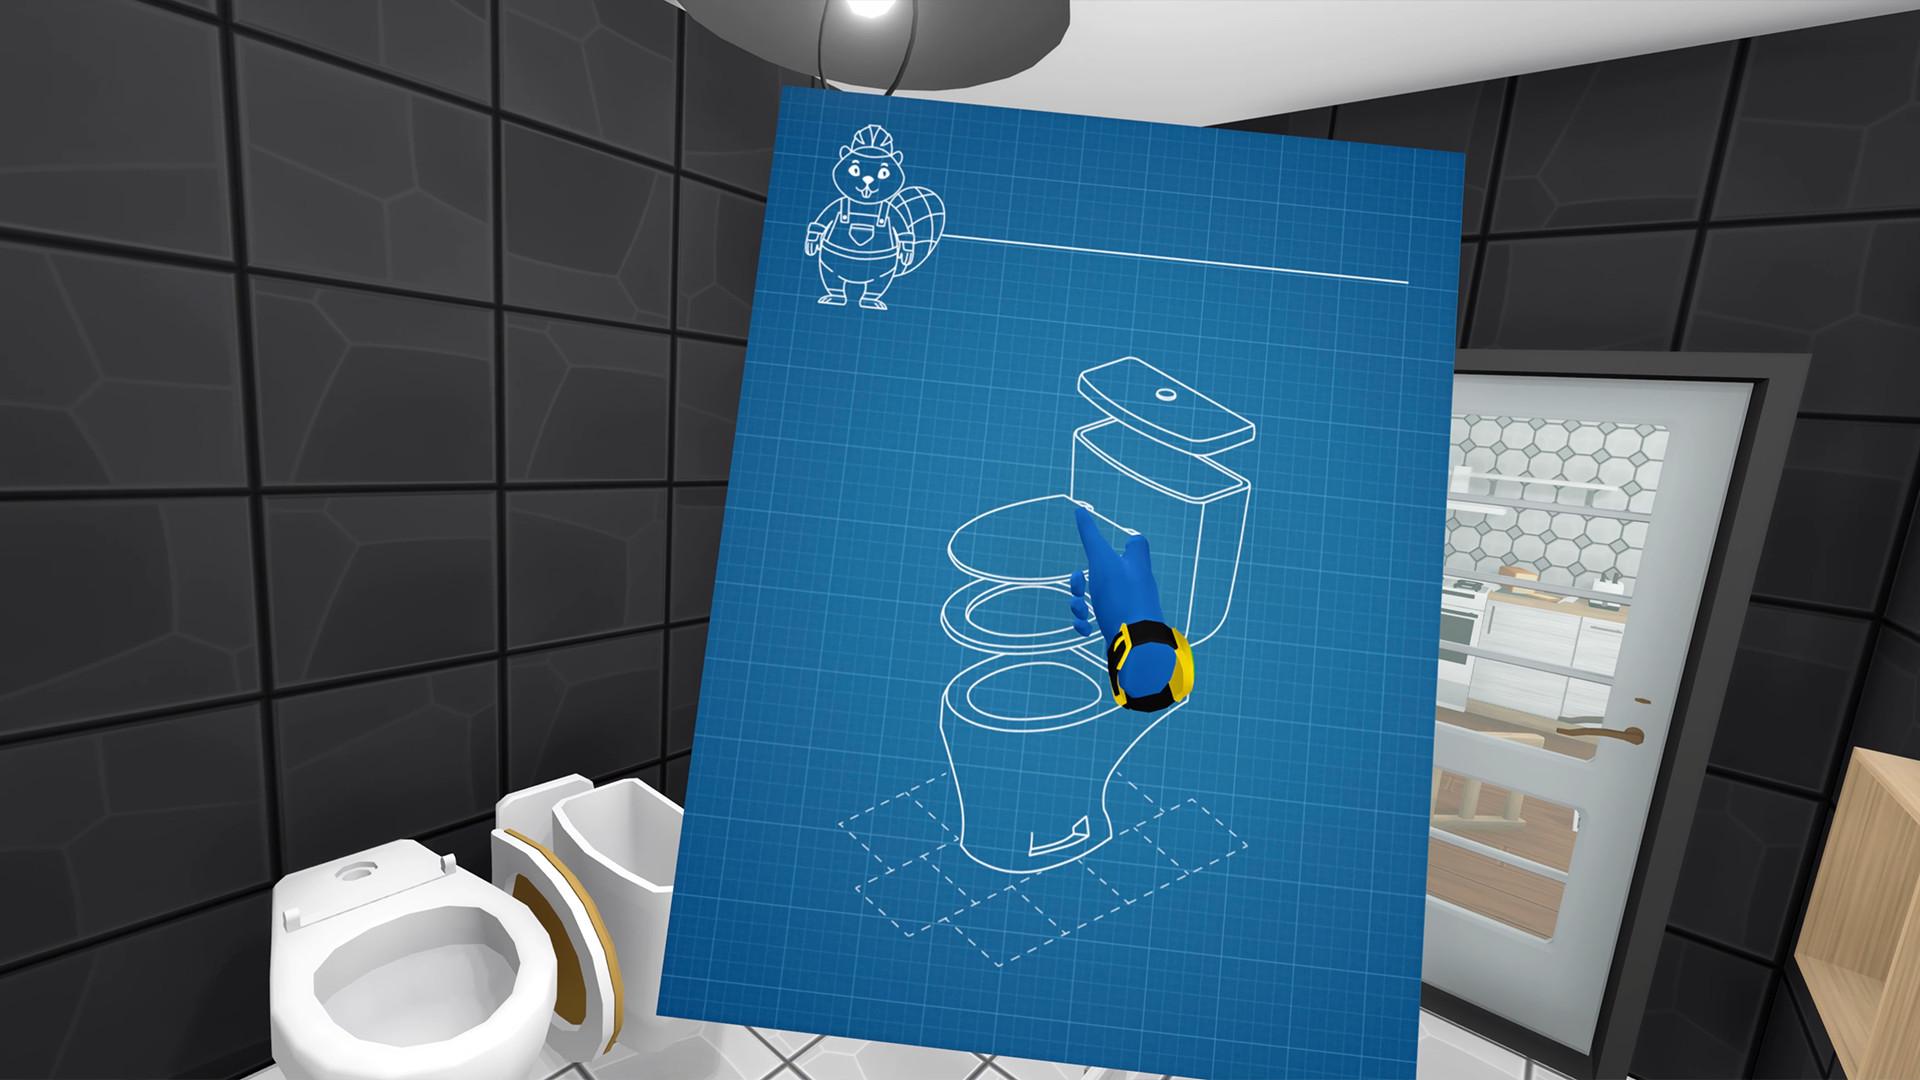 Oculus Quest 游戏《House Flipper VR》房产达人插图(3)